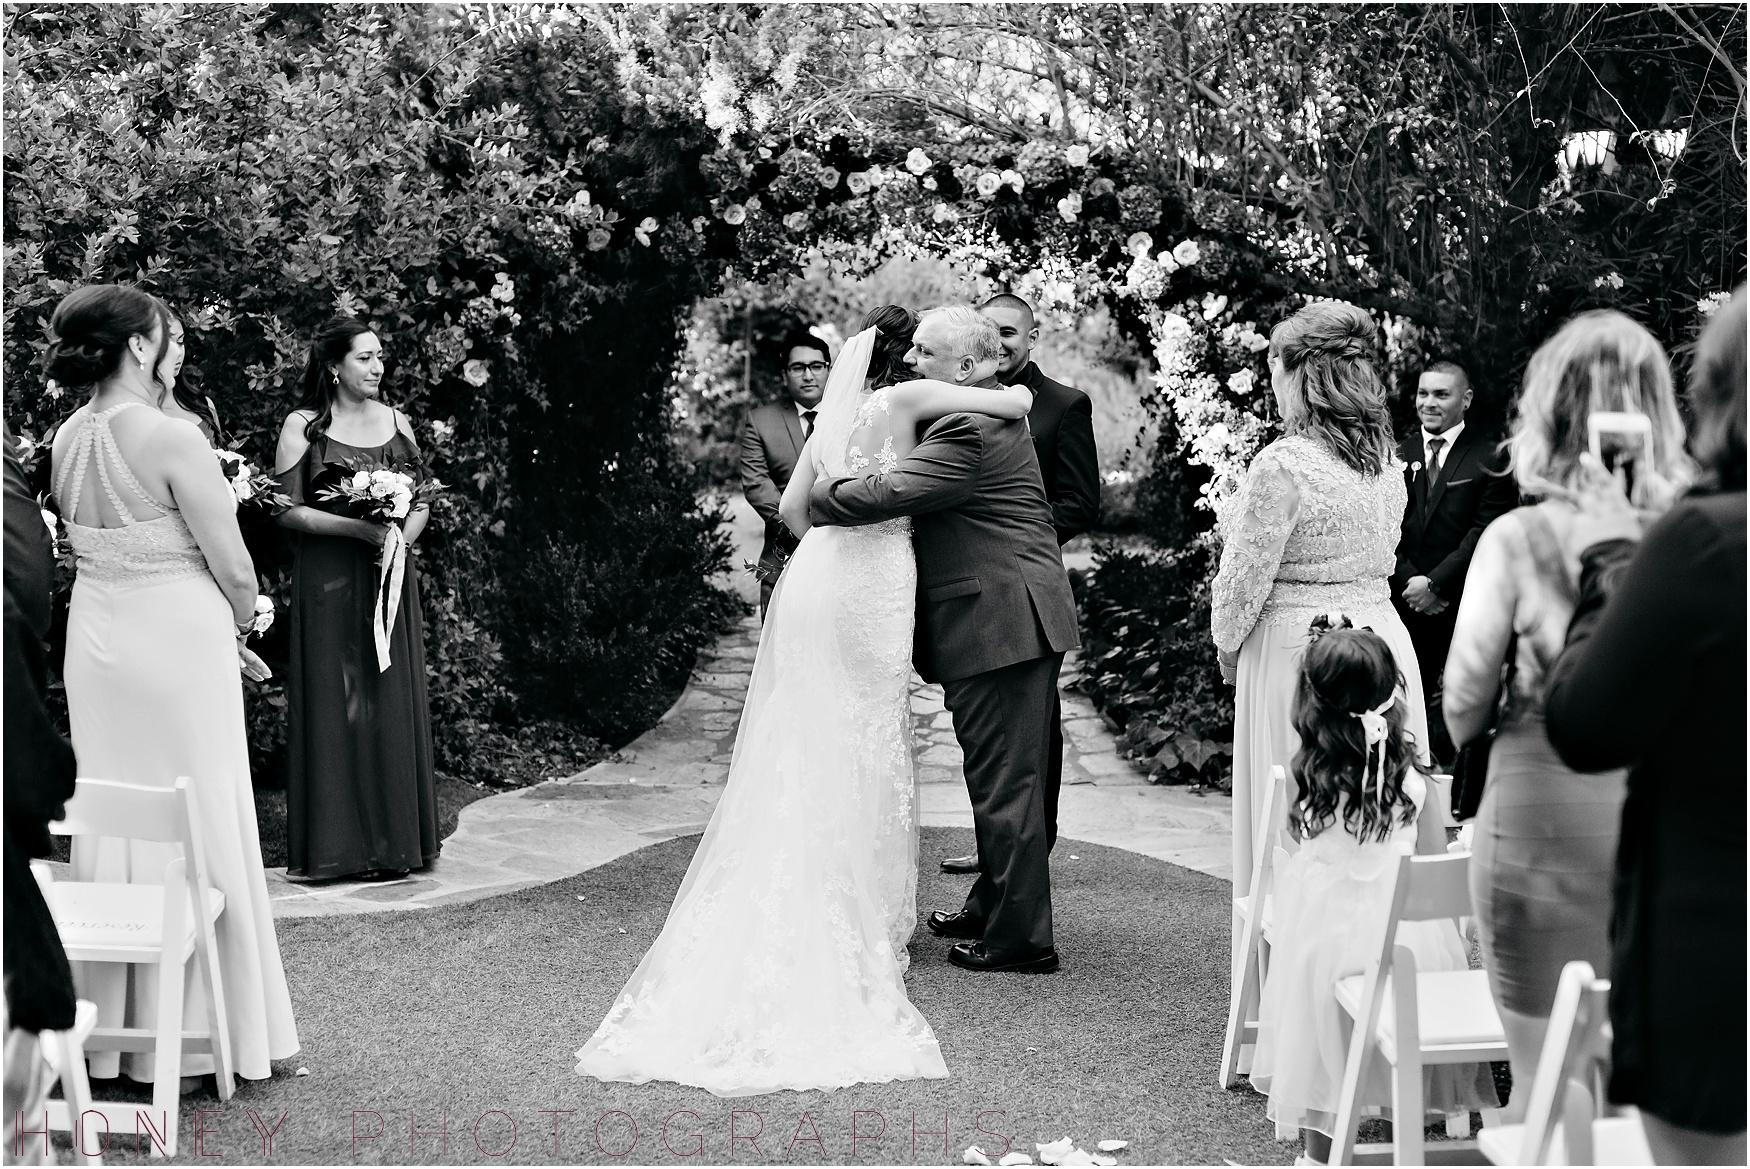 twin_oaks_garden_estate_fall_winter_burgundy_wedding017.jpg